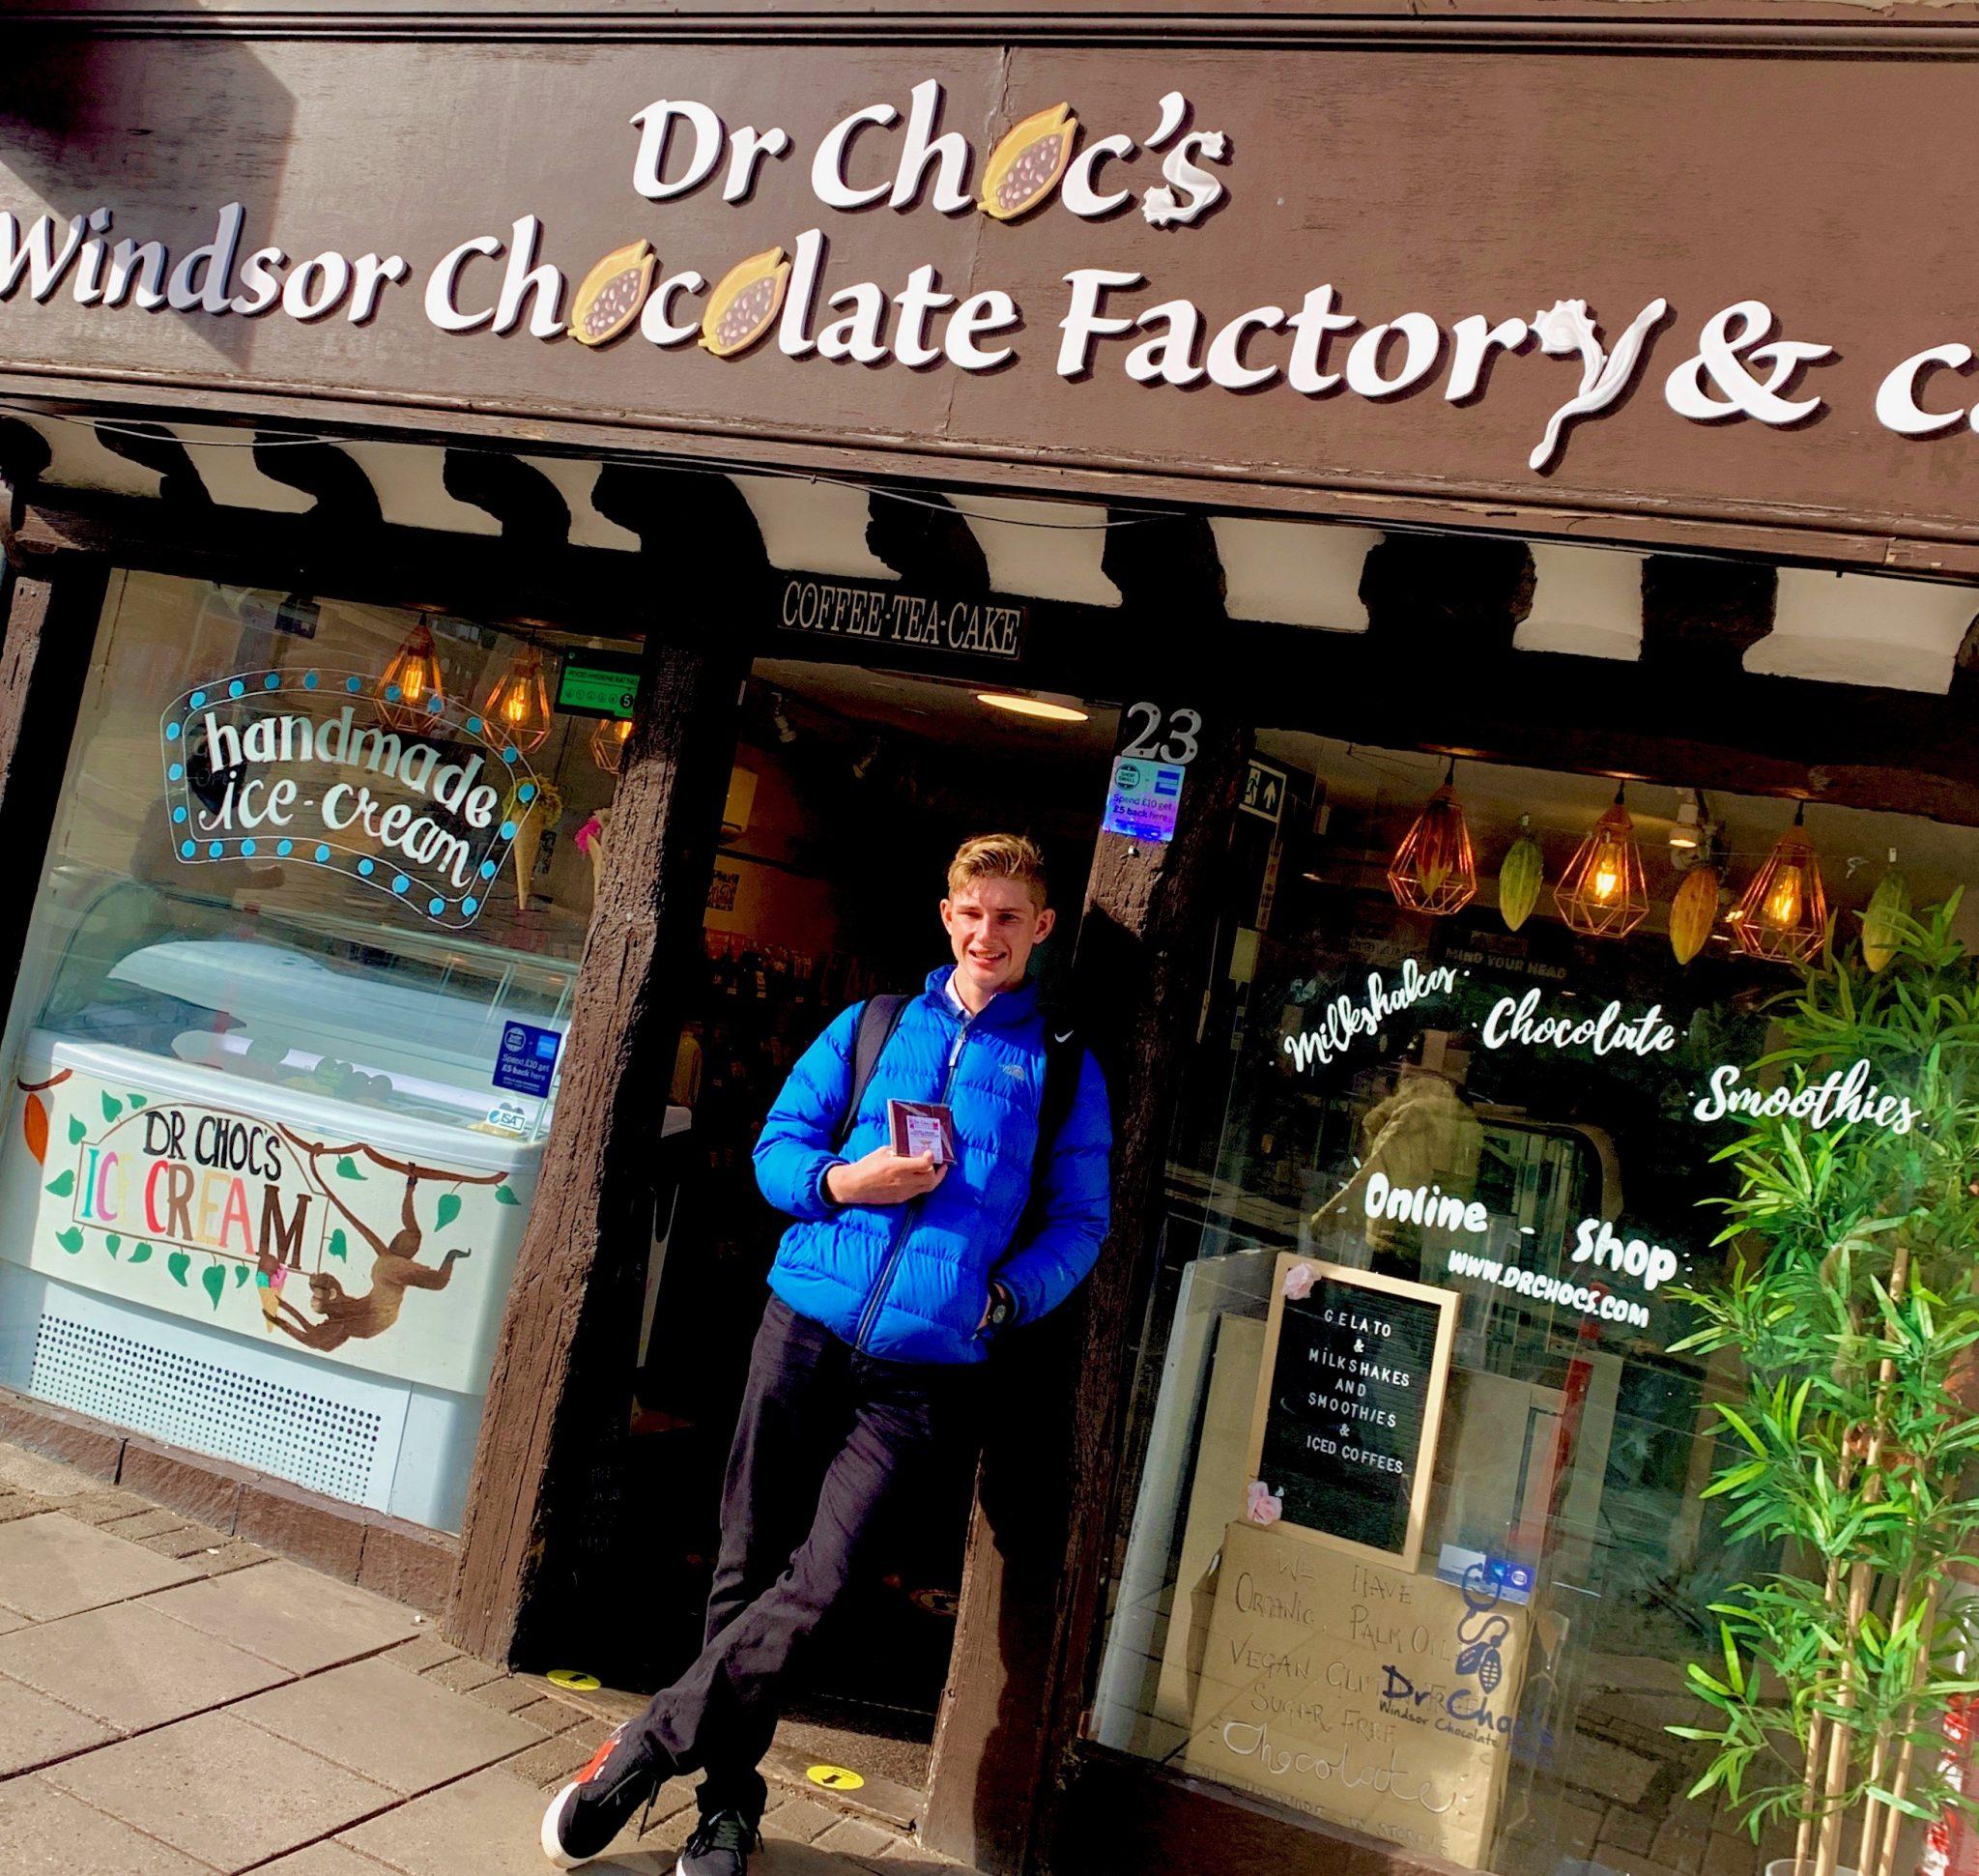 sr chocs windsor chocolate factory